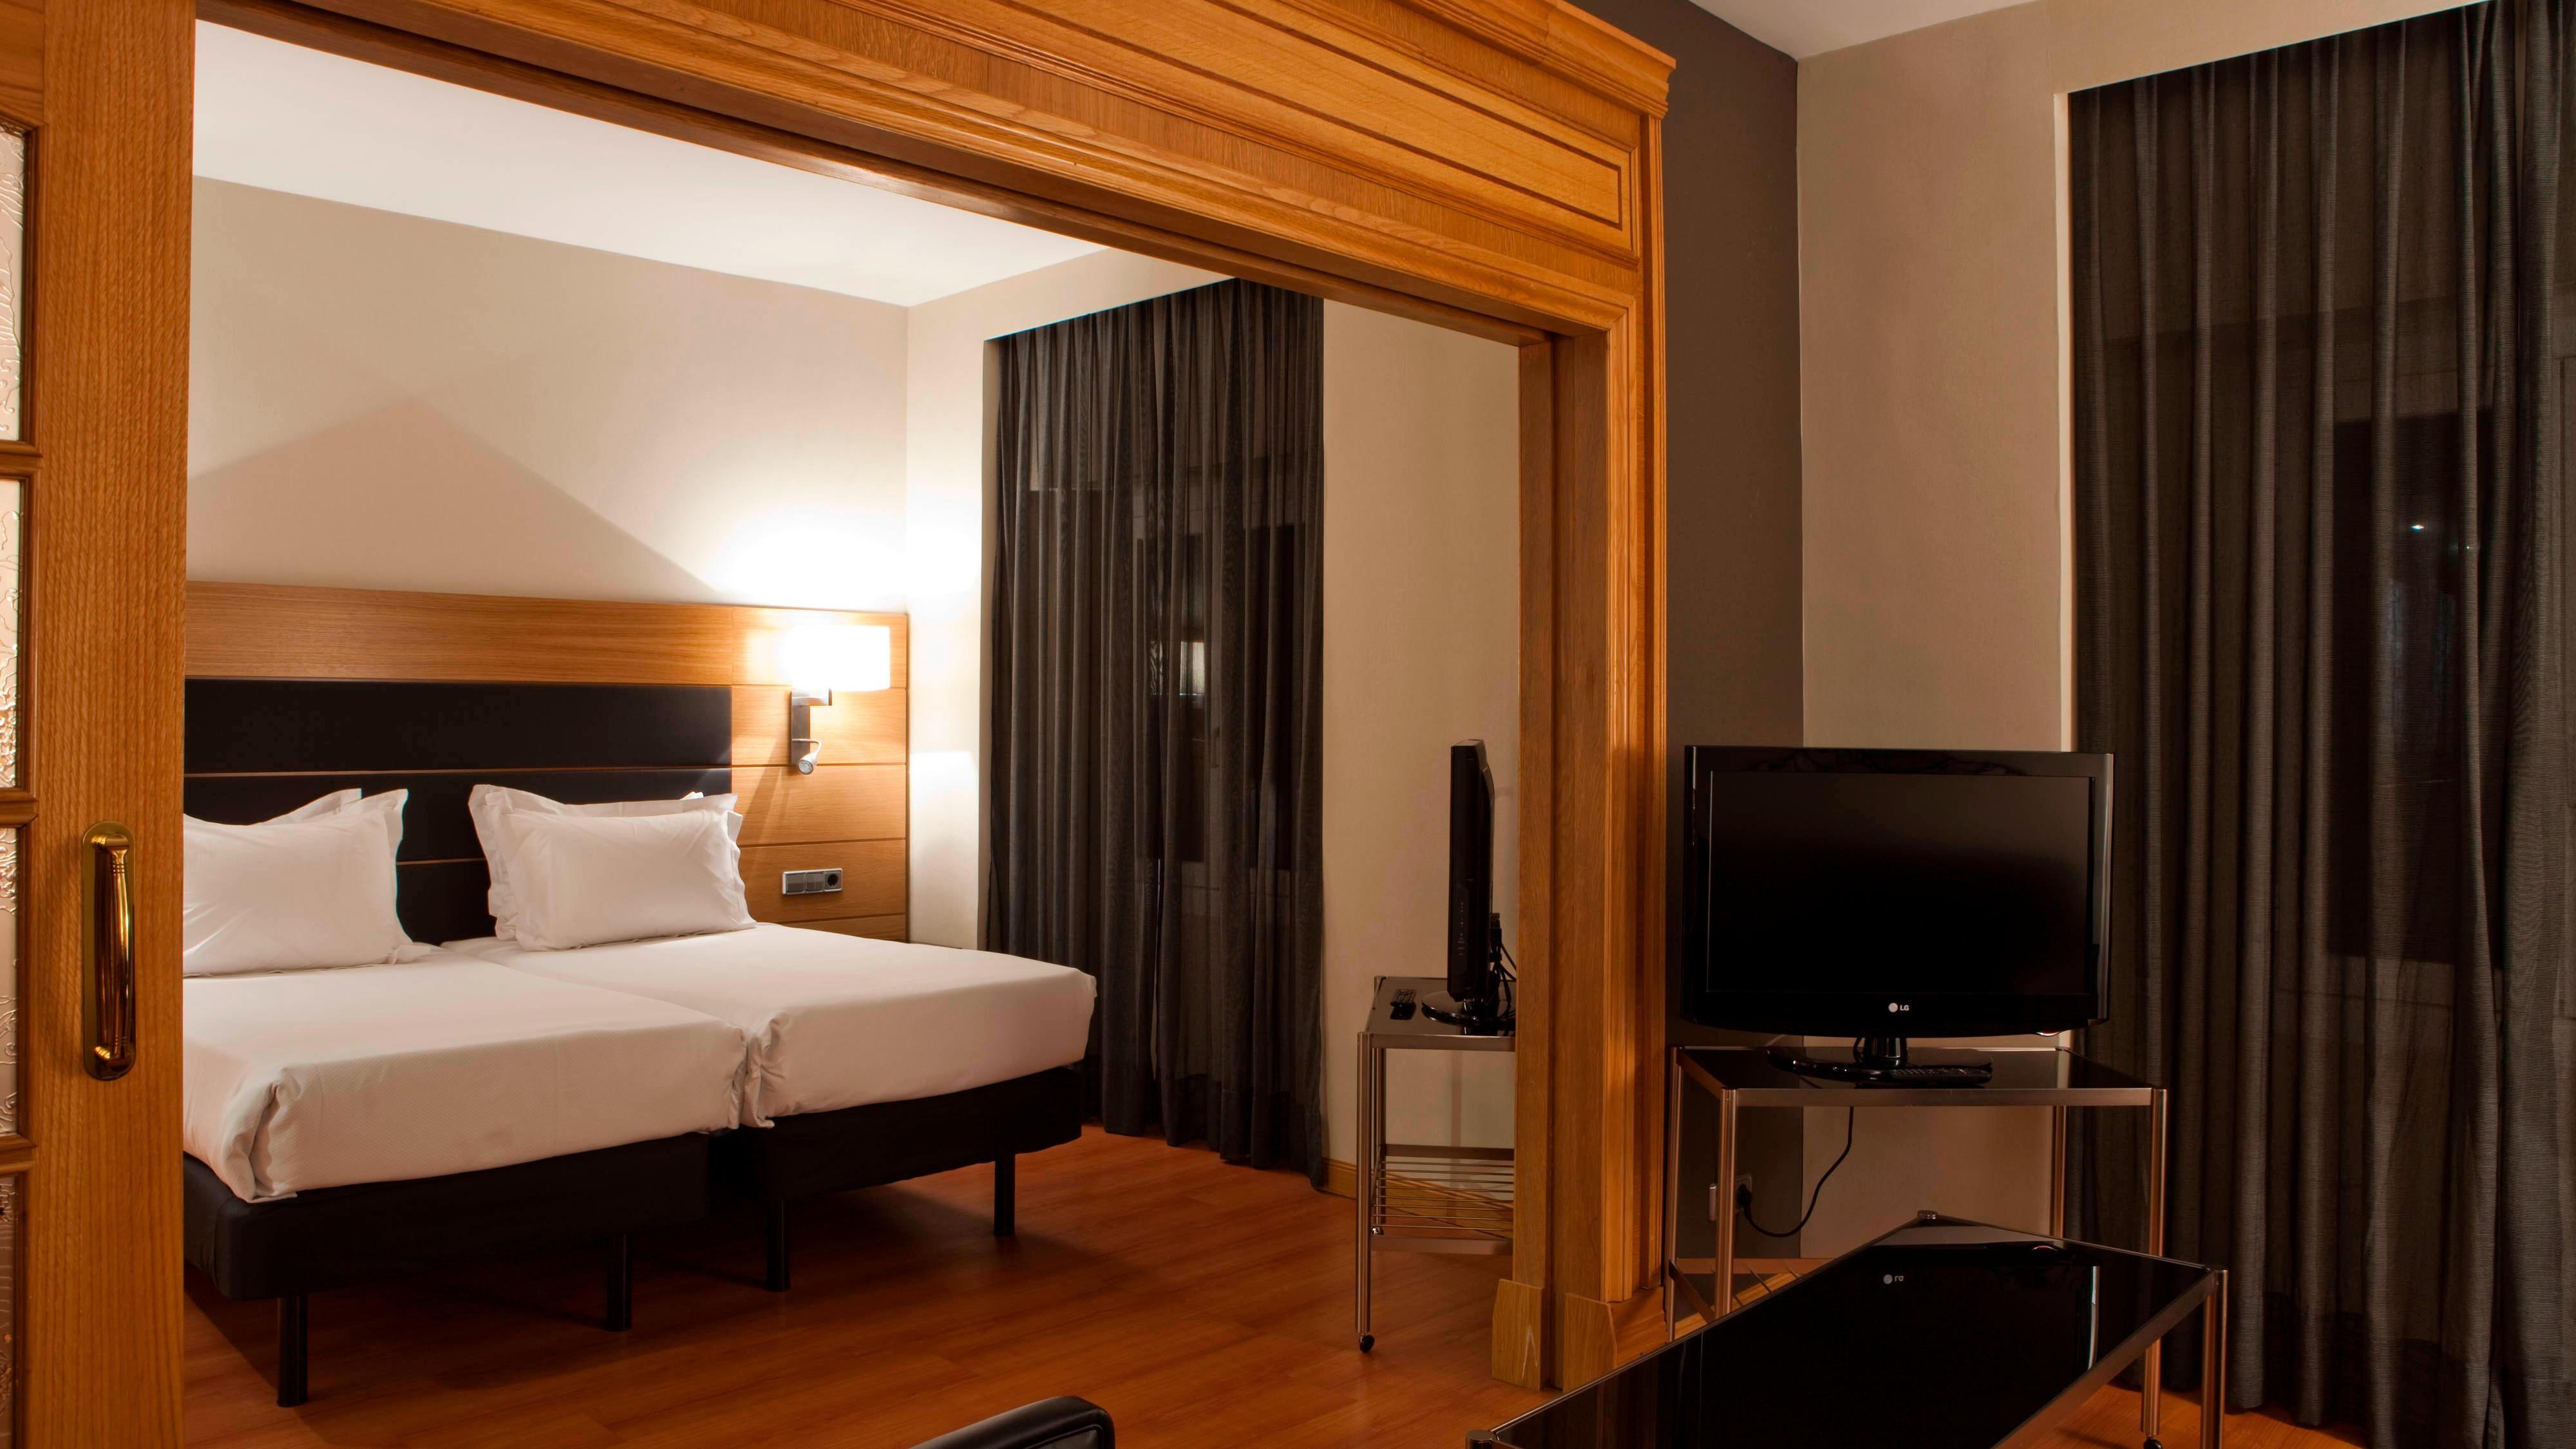 Madrid hotel wide superior rooms